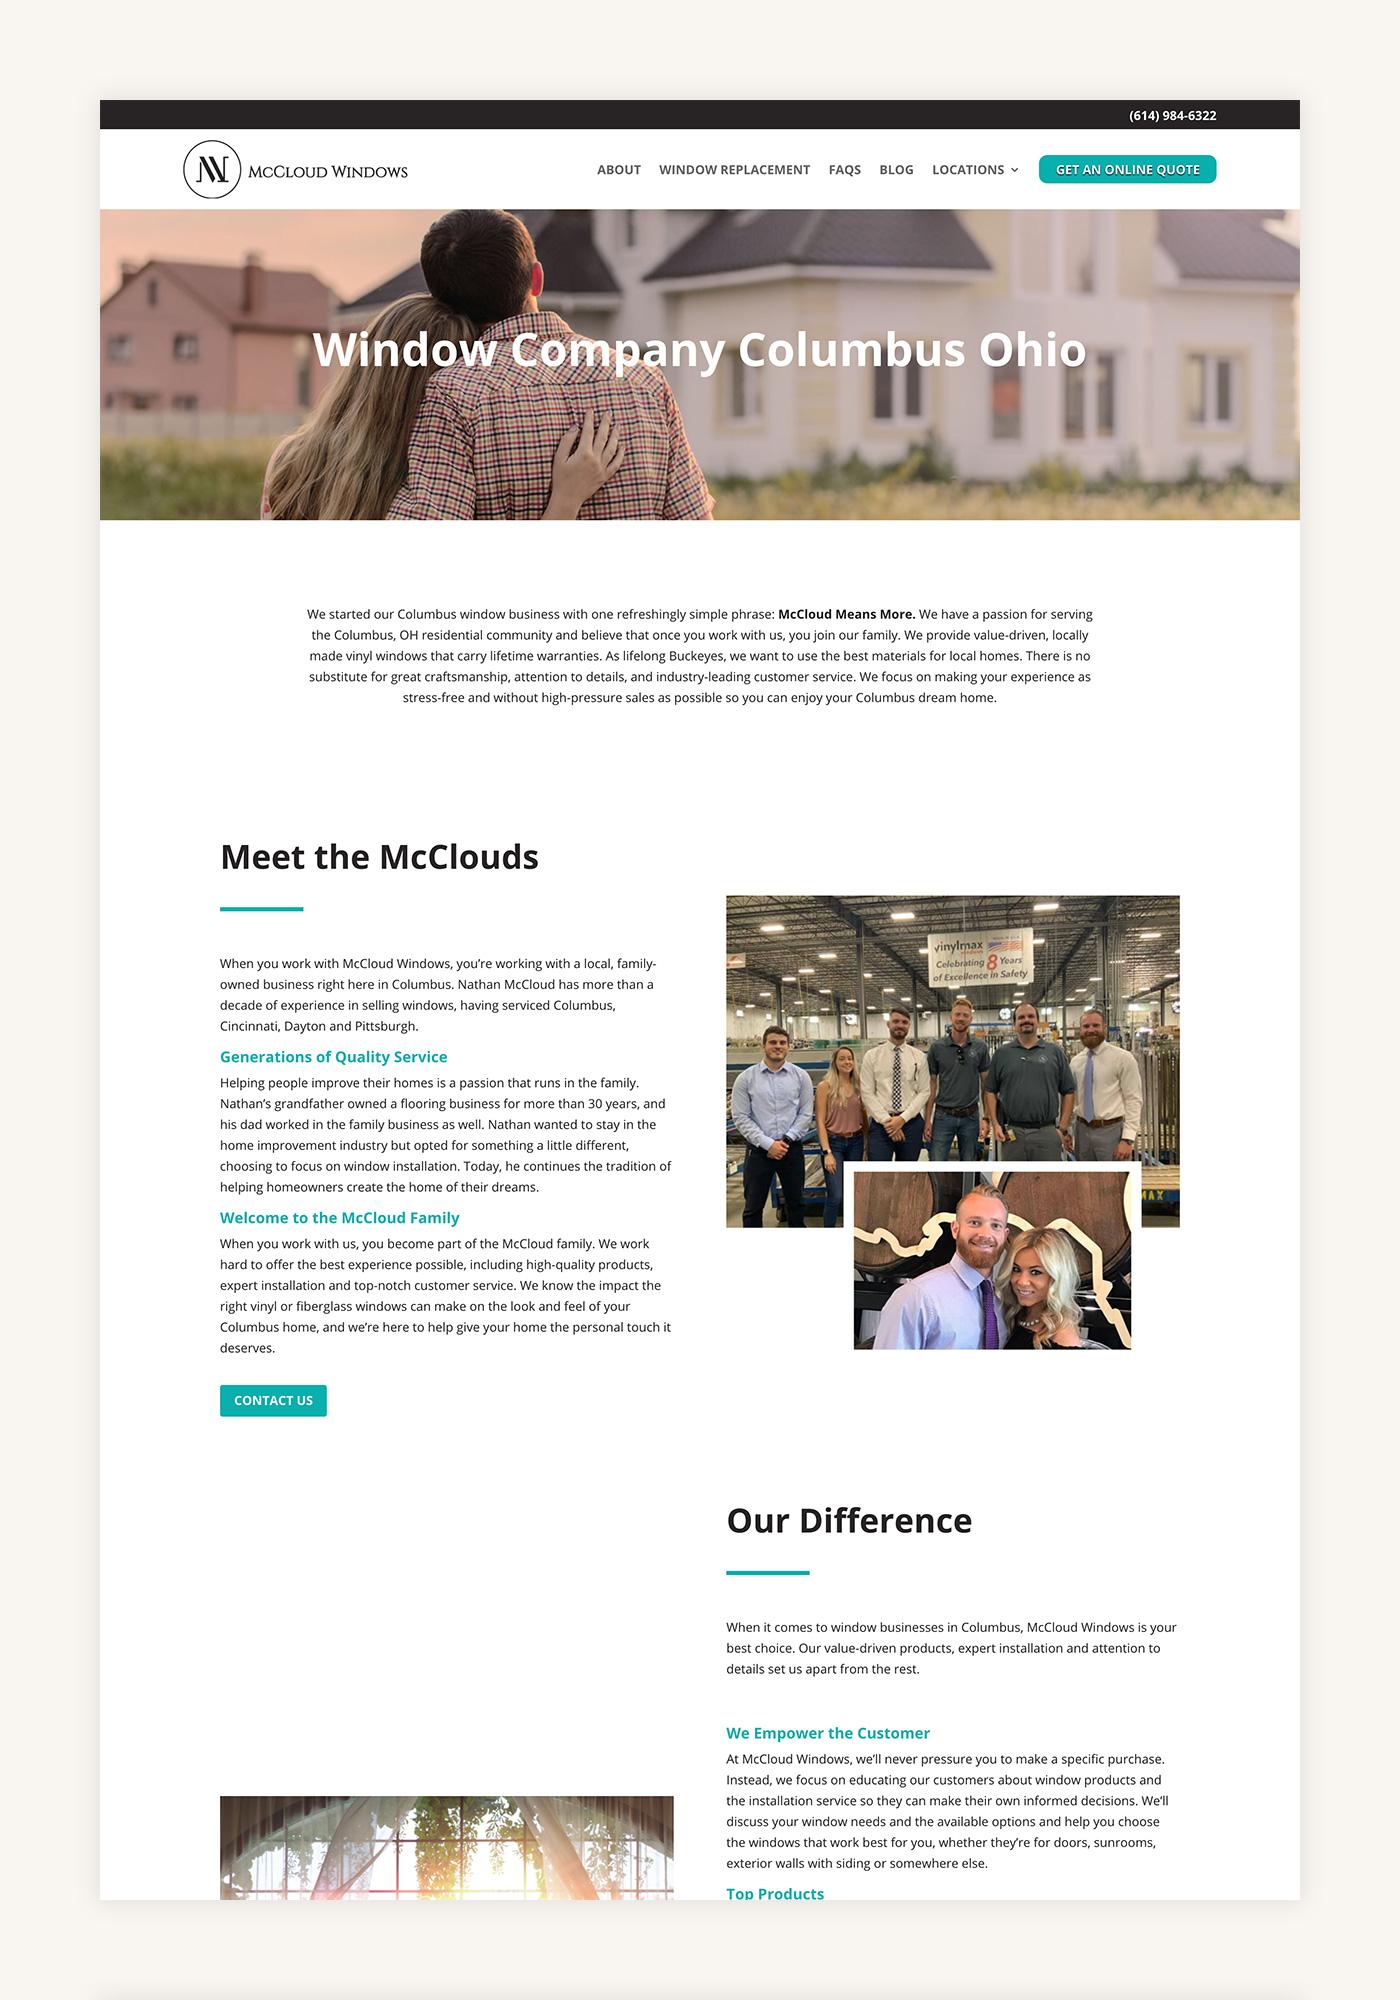 digital marketing company portfolio